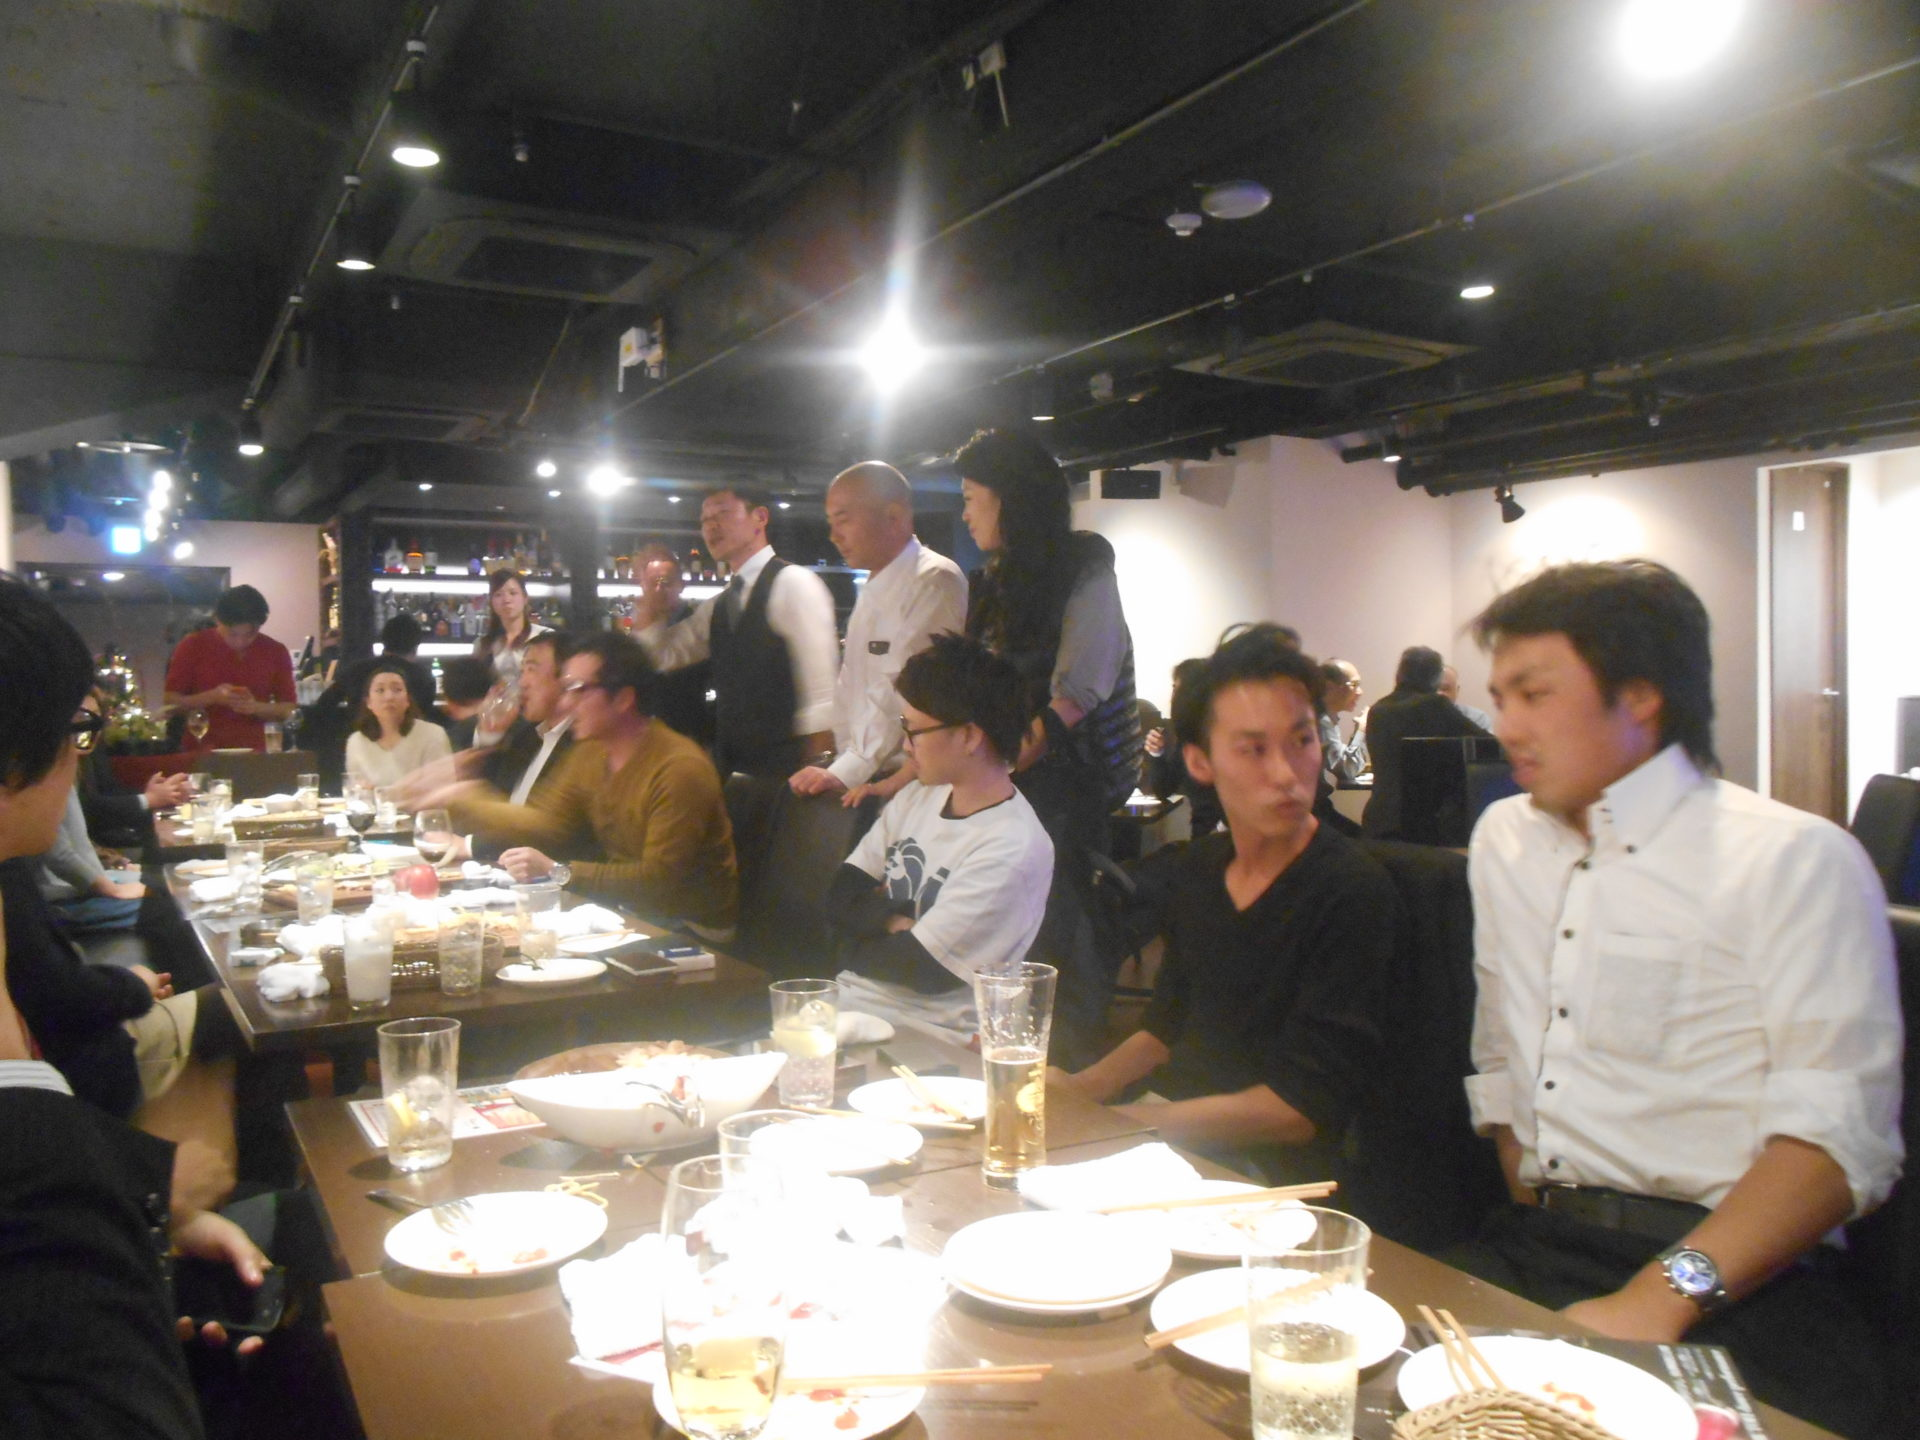 DSCN0329 1920x1440 - 2015年11月16日(月) AOsuki定例飲み会開催致しました。